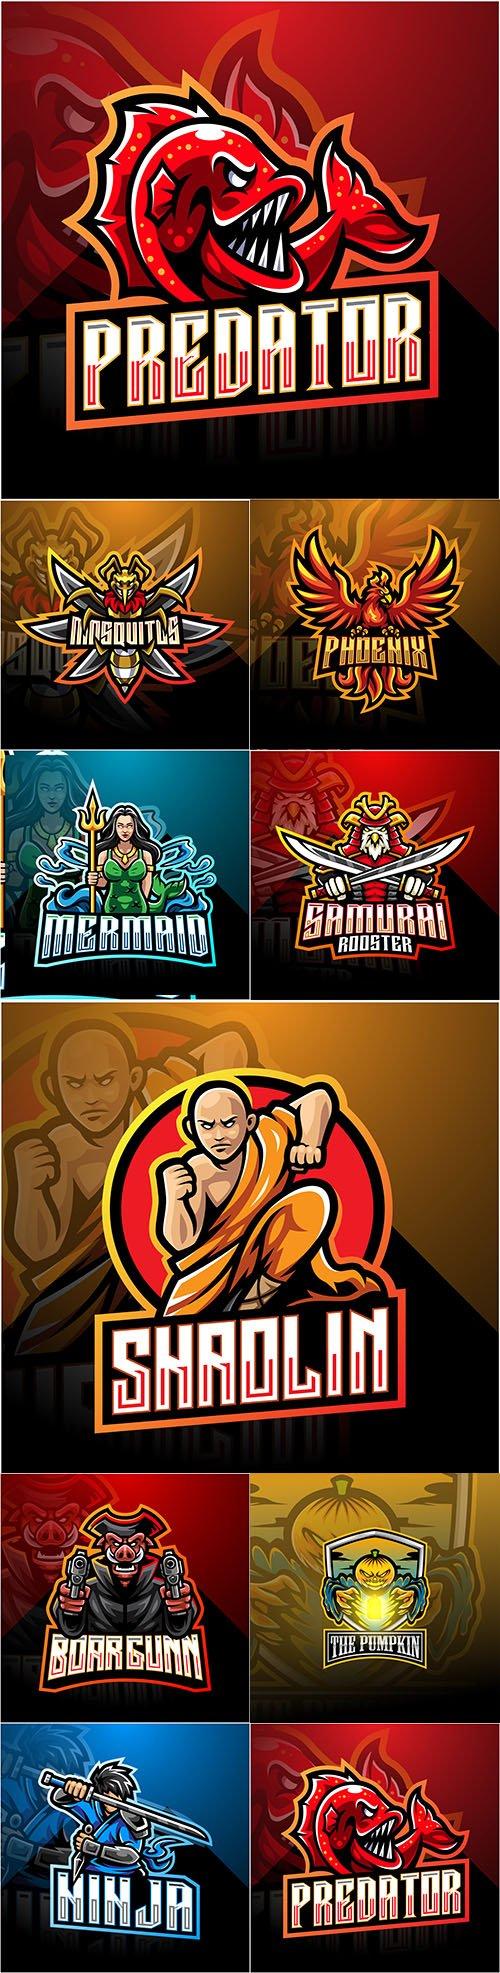 Cybersport mascot design logo illustration 19